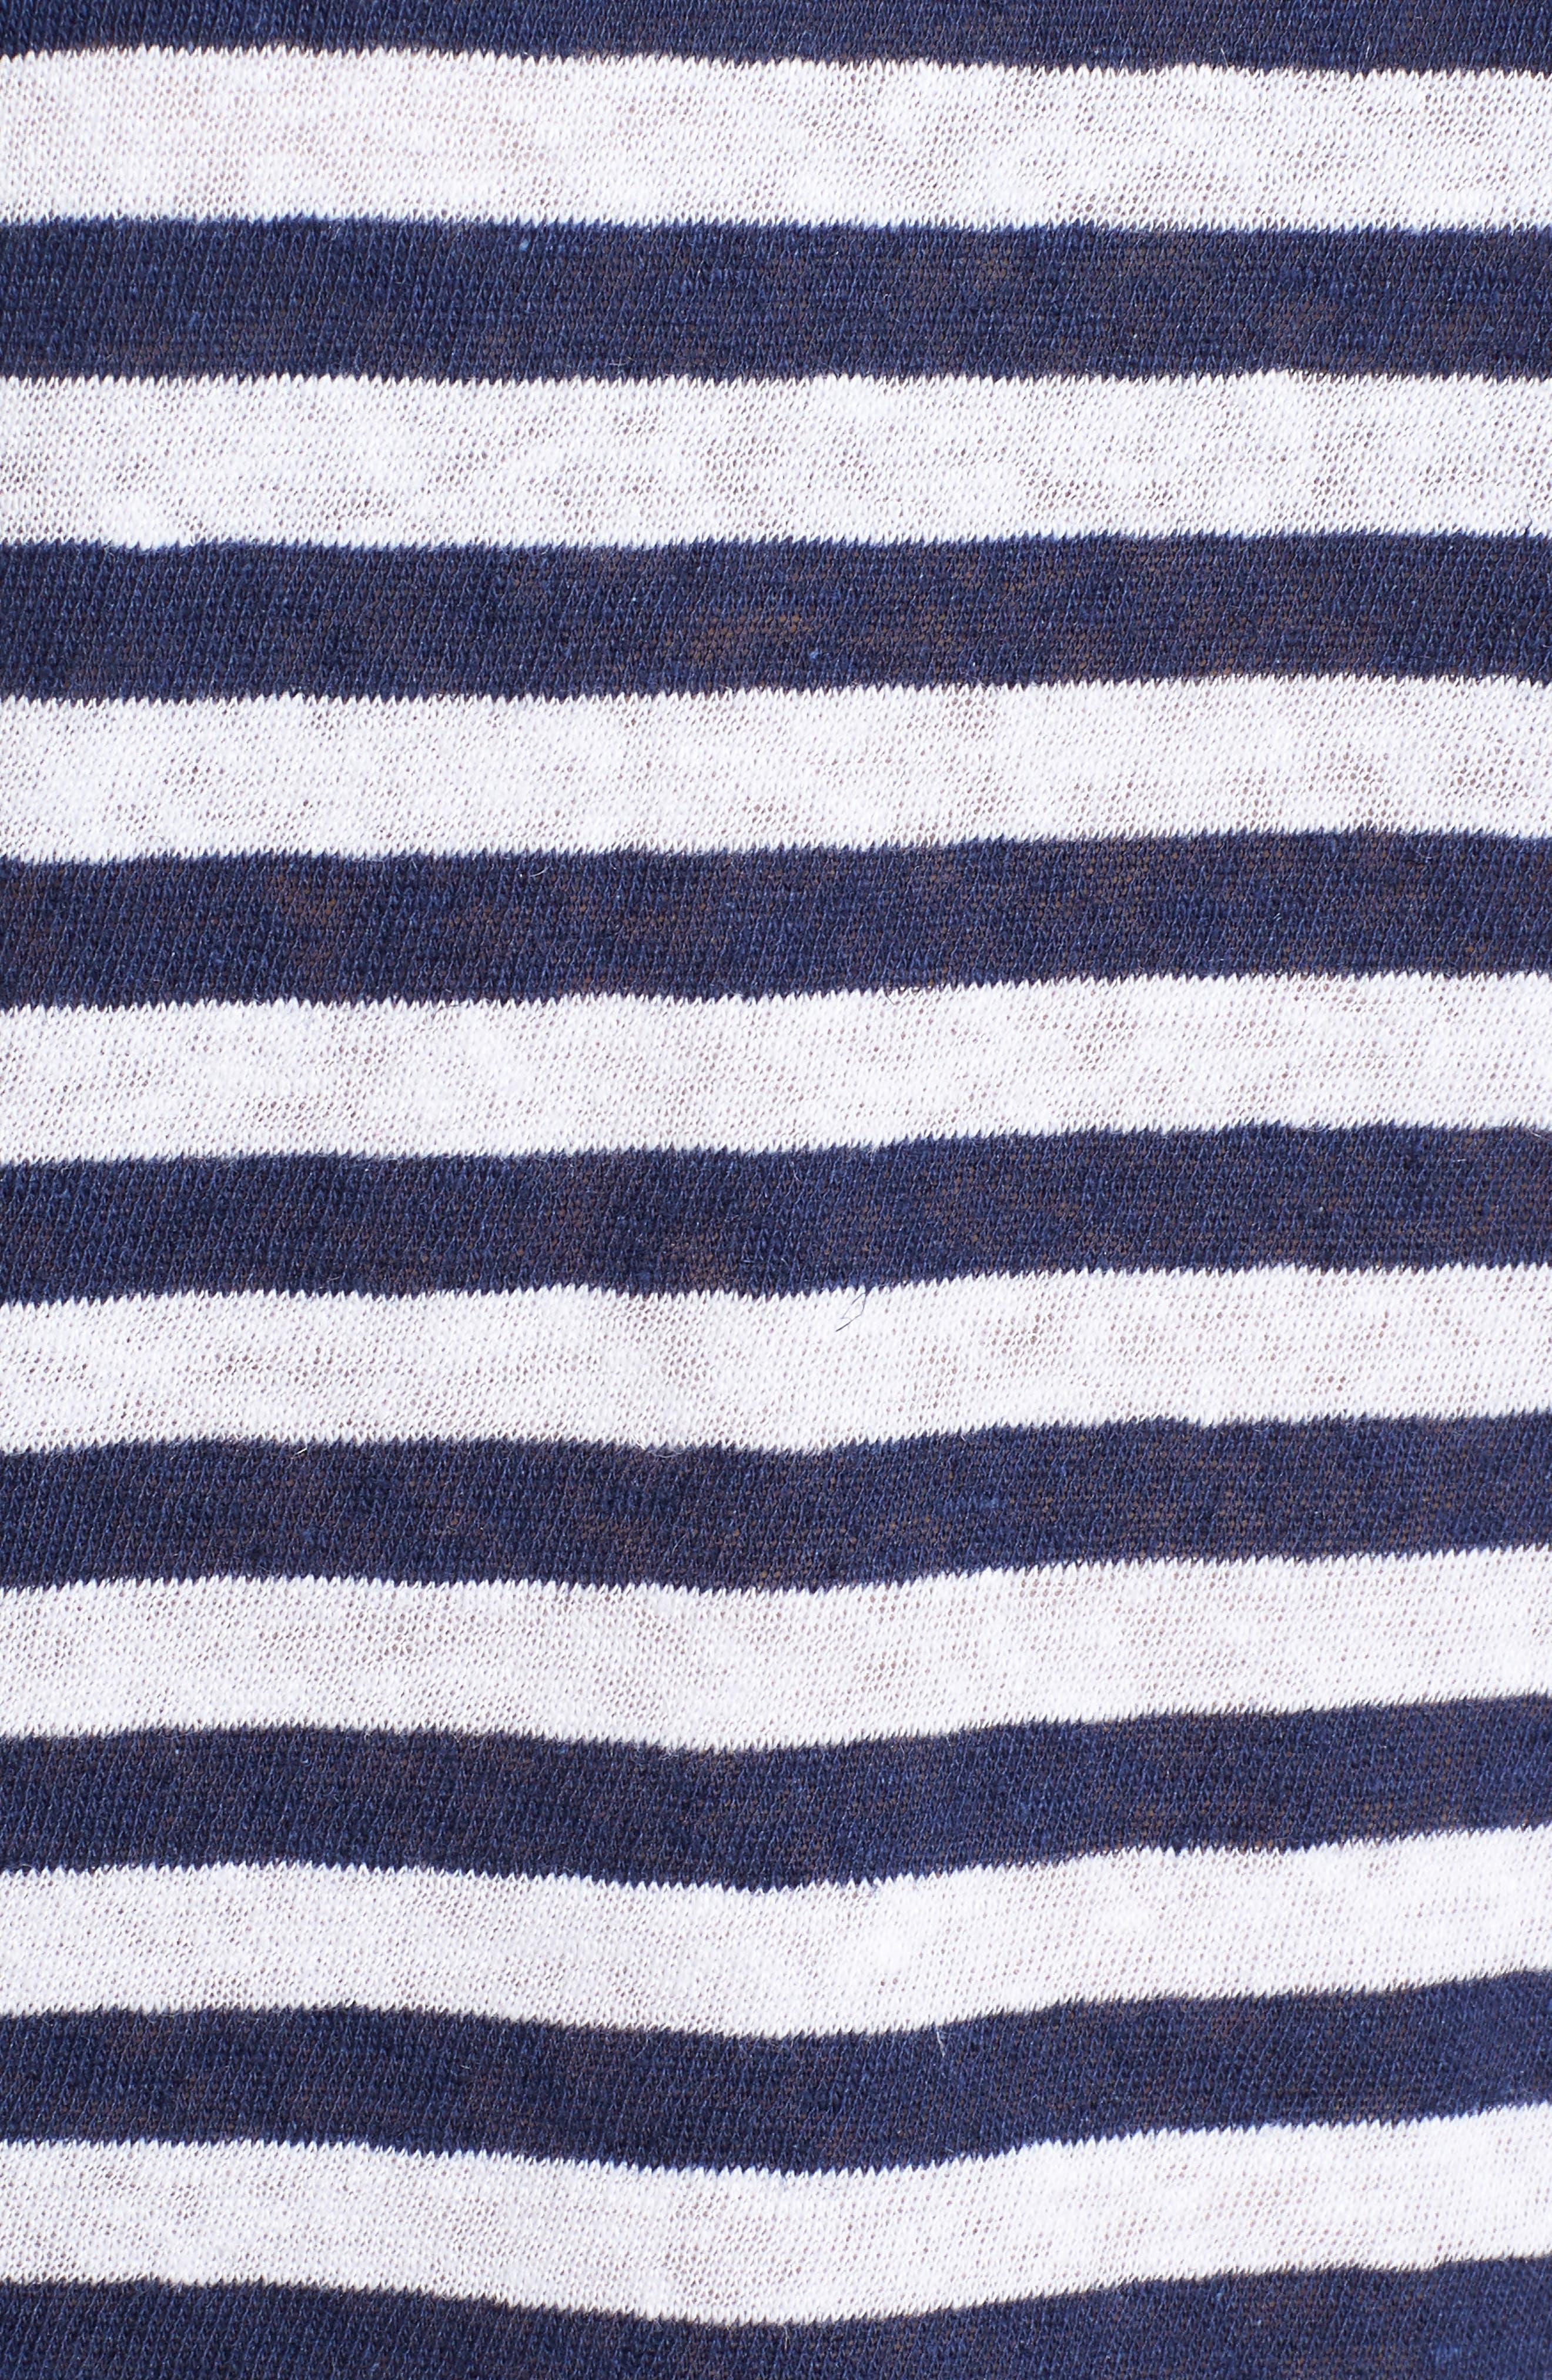 Linen Roll Sleeve Pocket Tee,                             Alternate thumbnail 6, color,                             Deep Bay